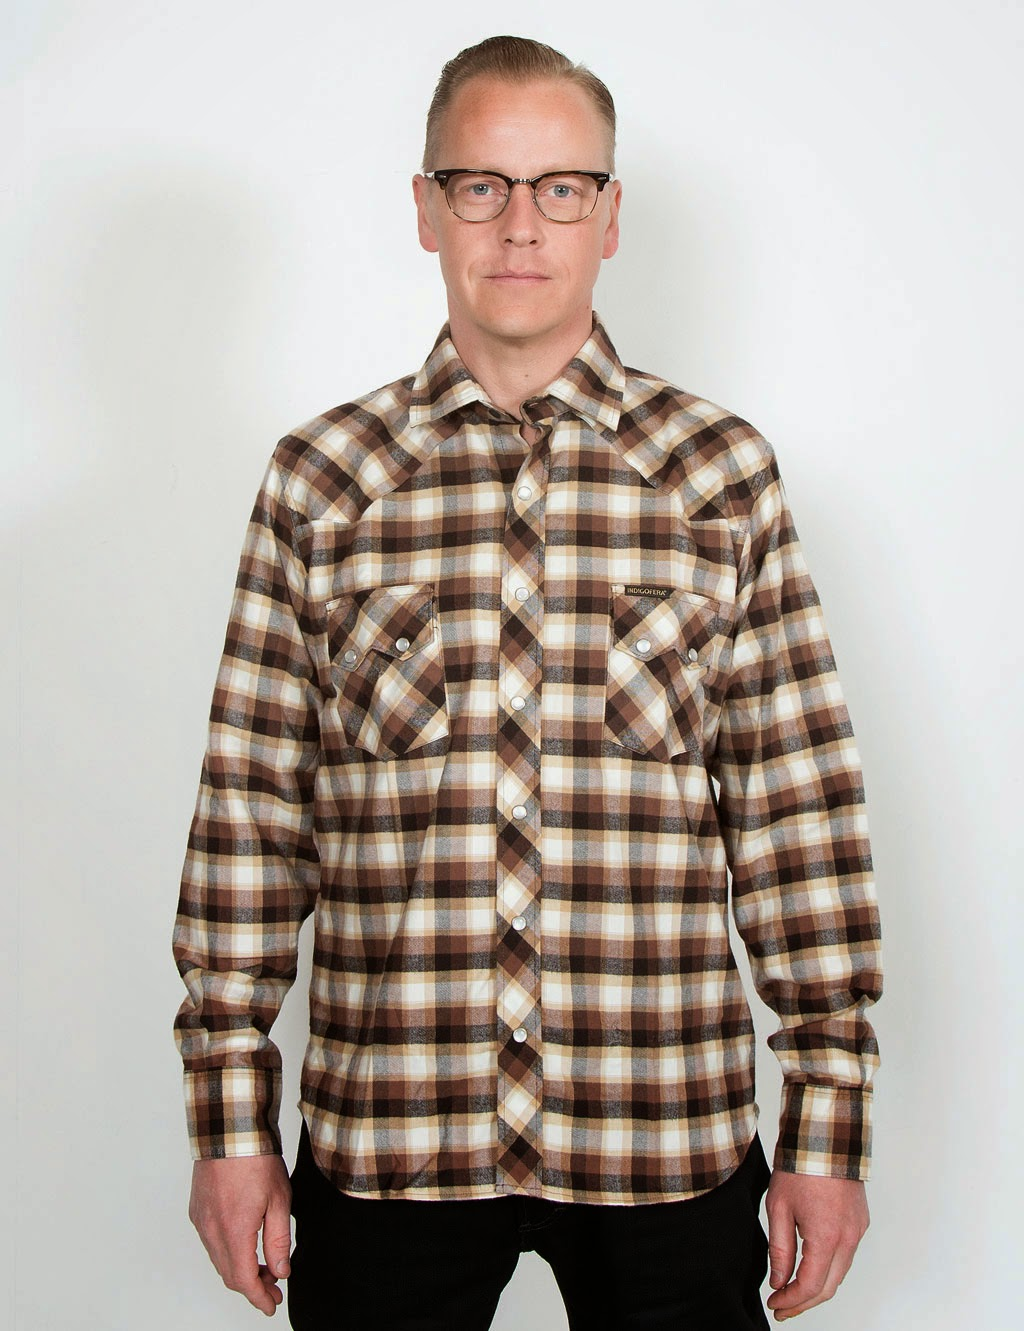 http://www.hepcat.se/departments/indigofera-dollard-shirt-checked-brownblack